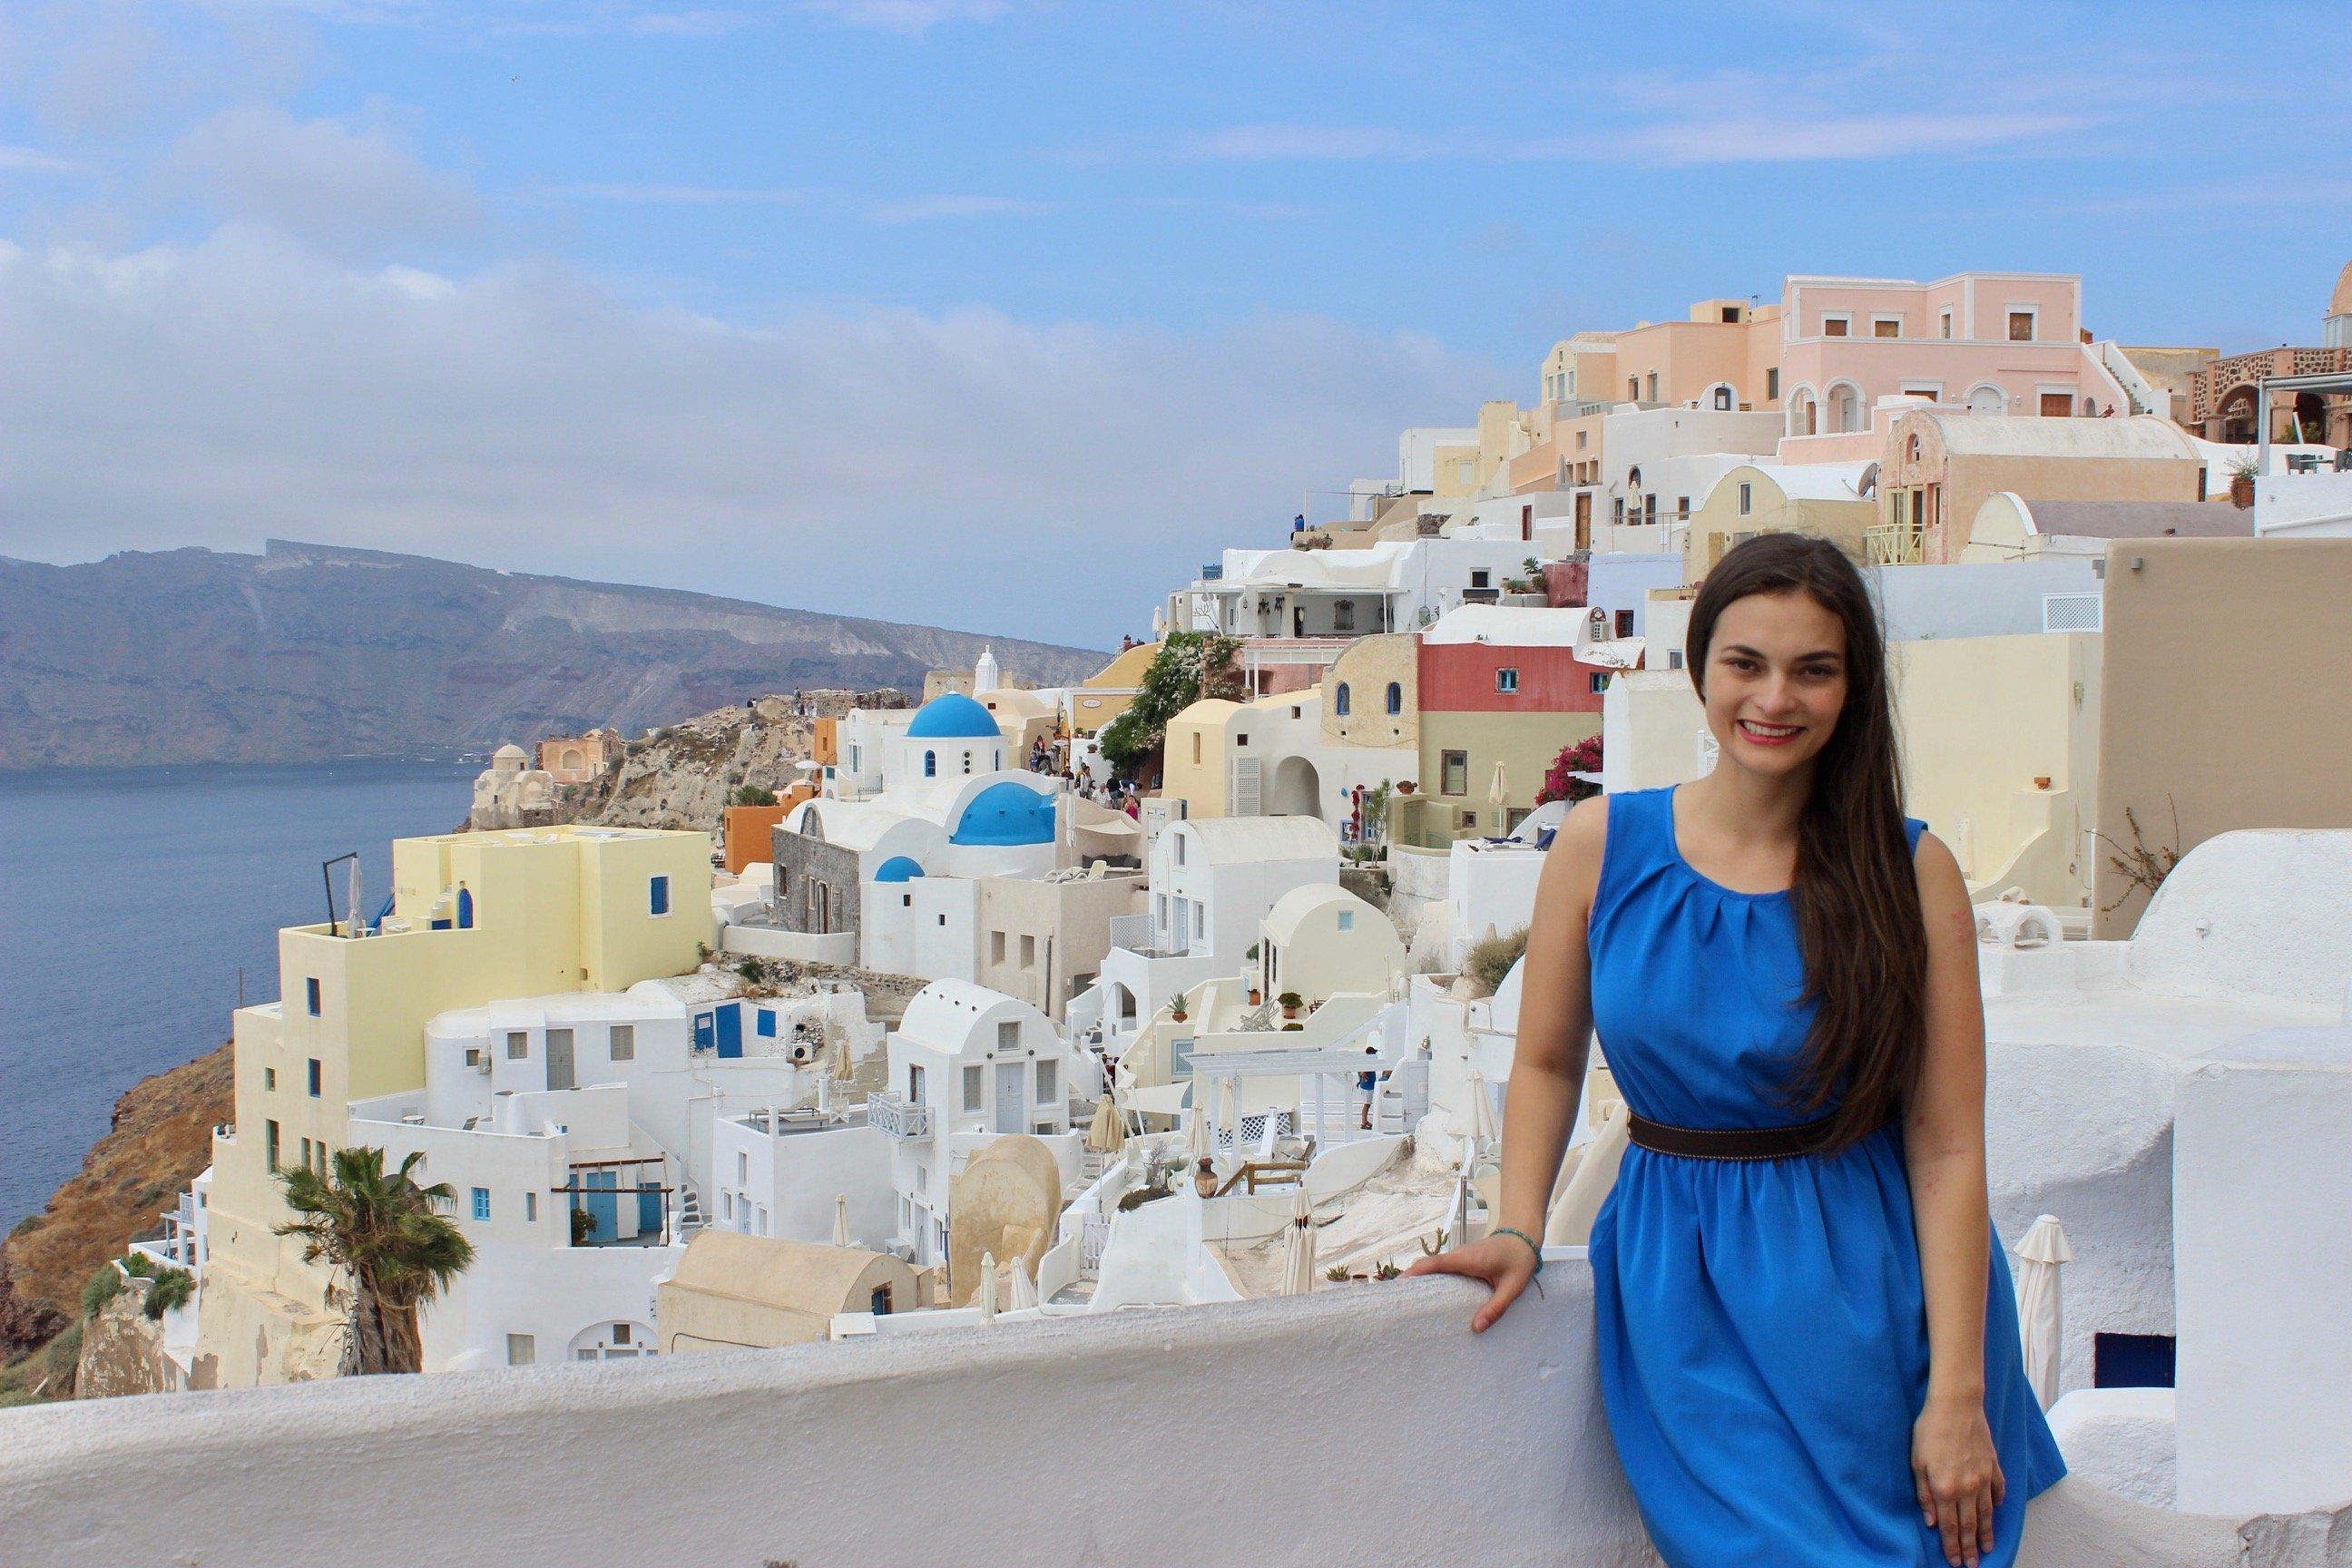 Enjoying the view in Santorini, Greece.